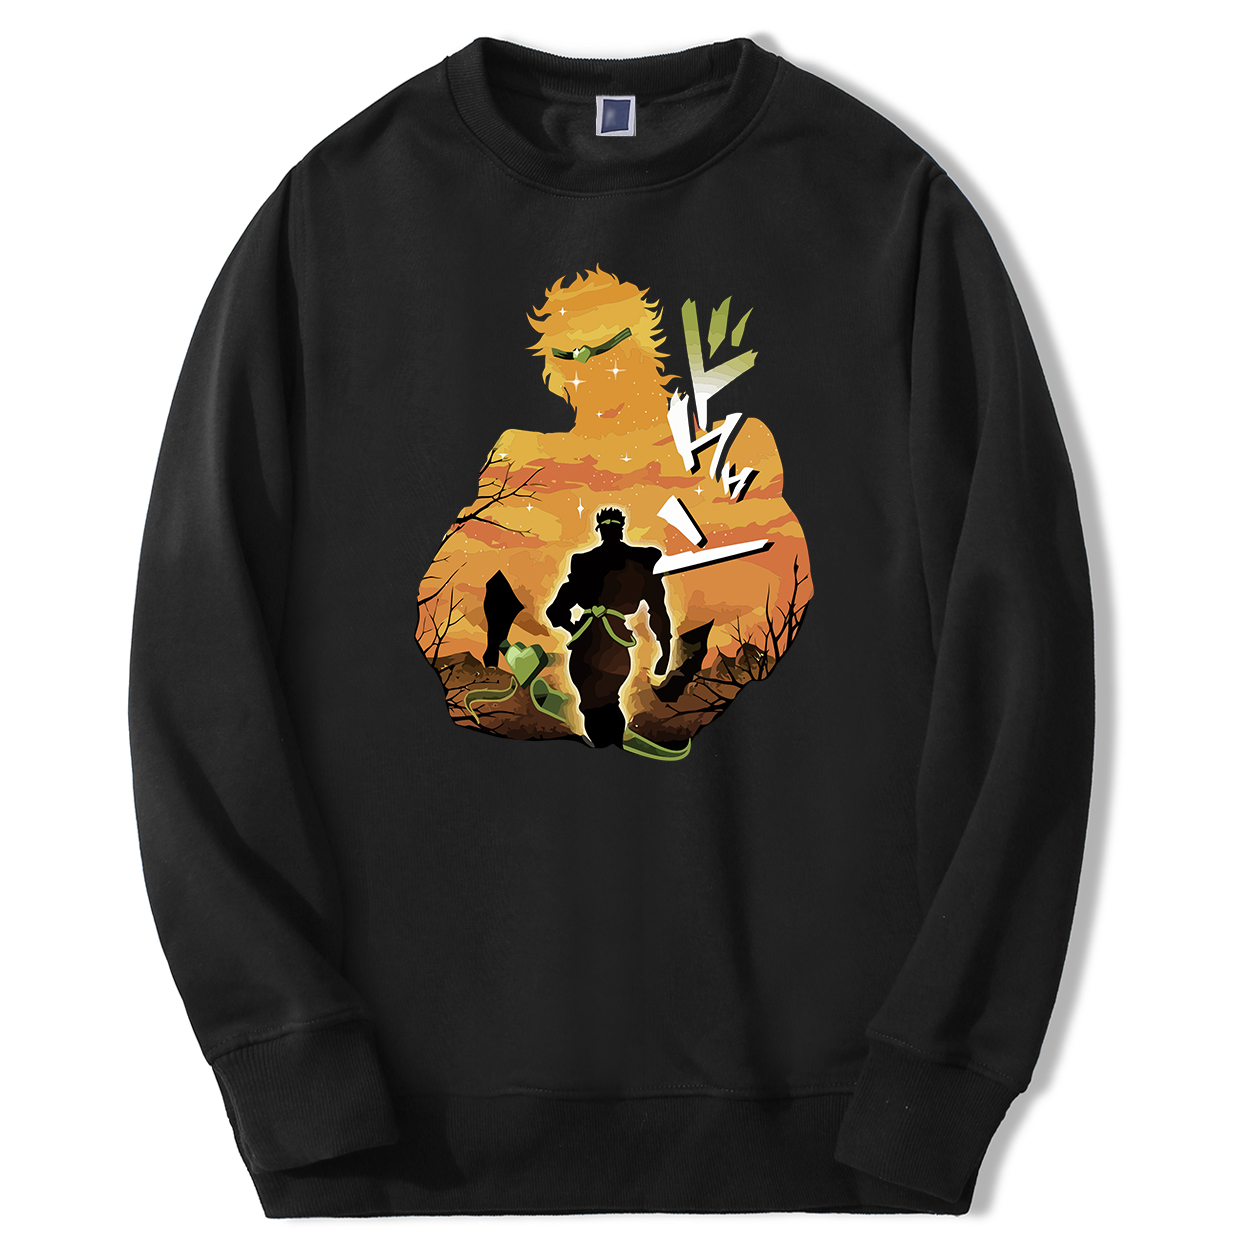 Jojos Bizarre Adventure Hoodie Men Dio Japan Anime JOJO Hoodies Sweatshirt Fleece Sportswear New Arrival Crewneck Sweatshirts